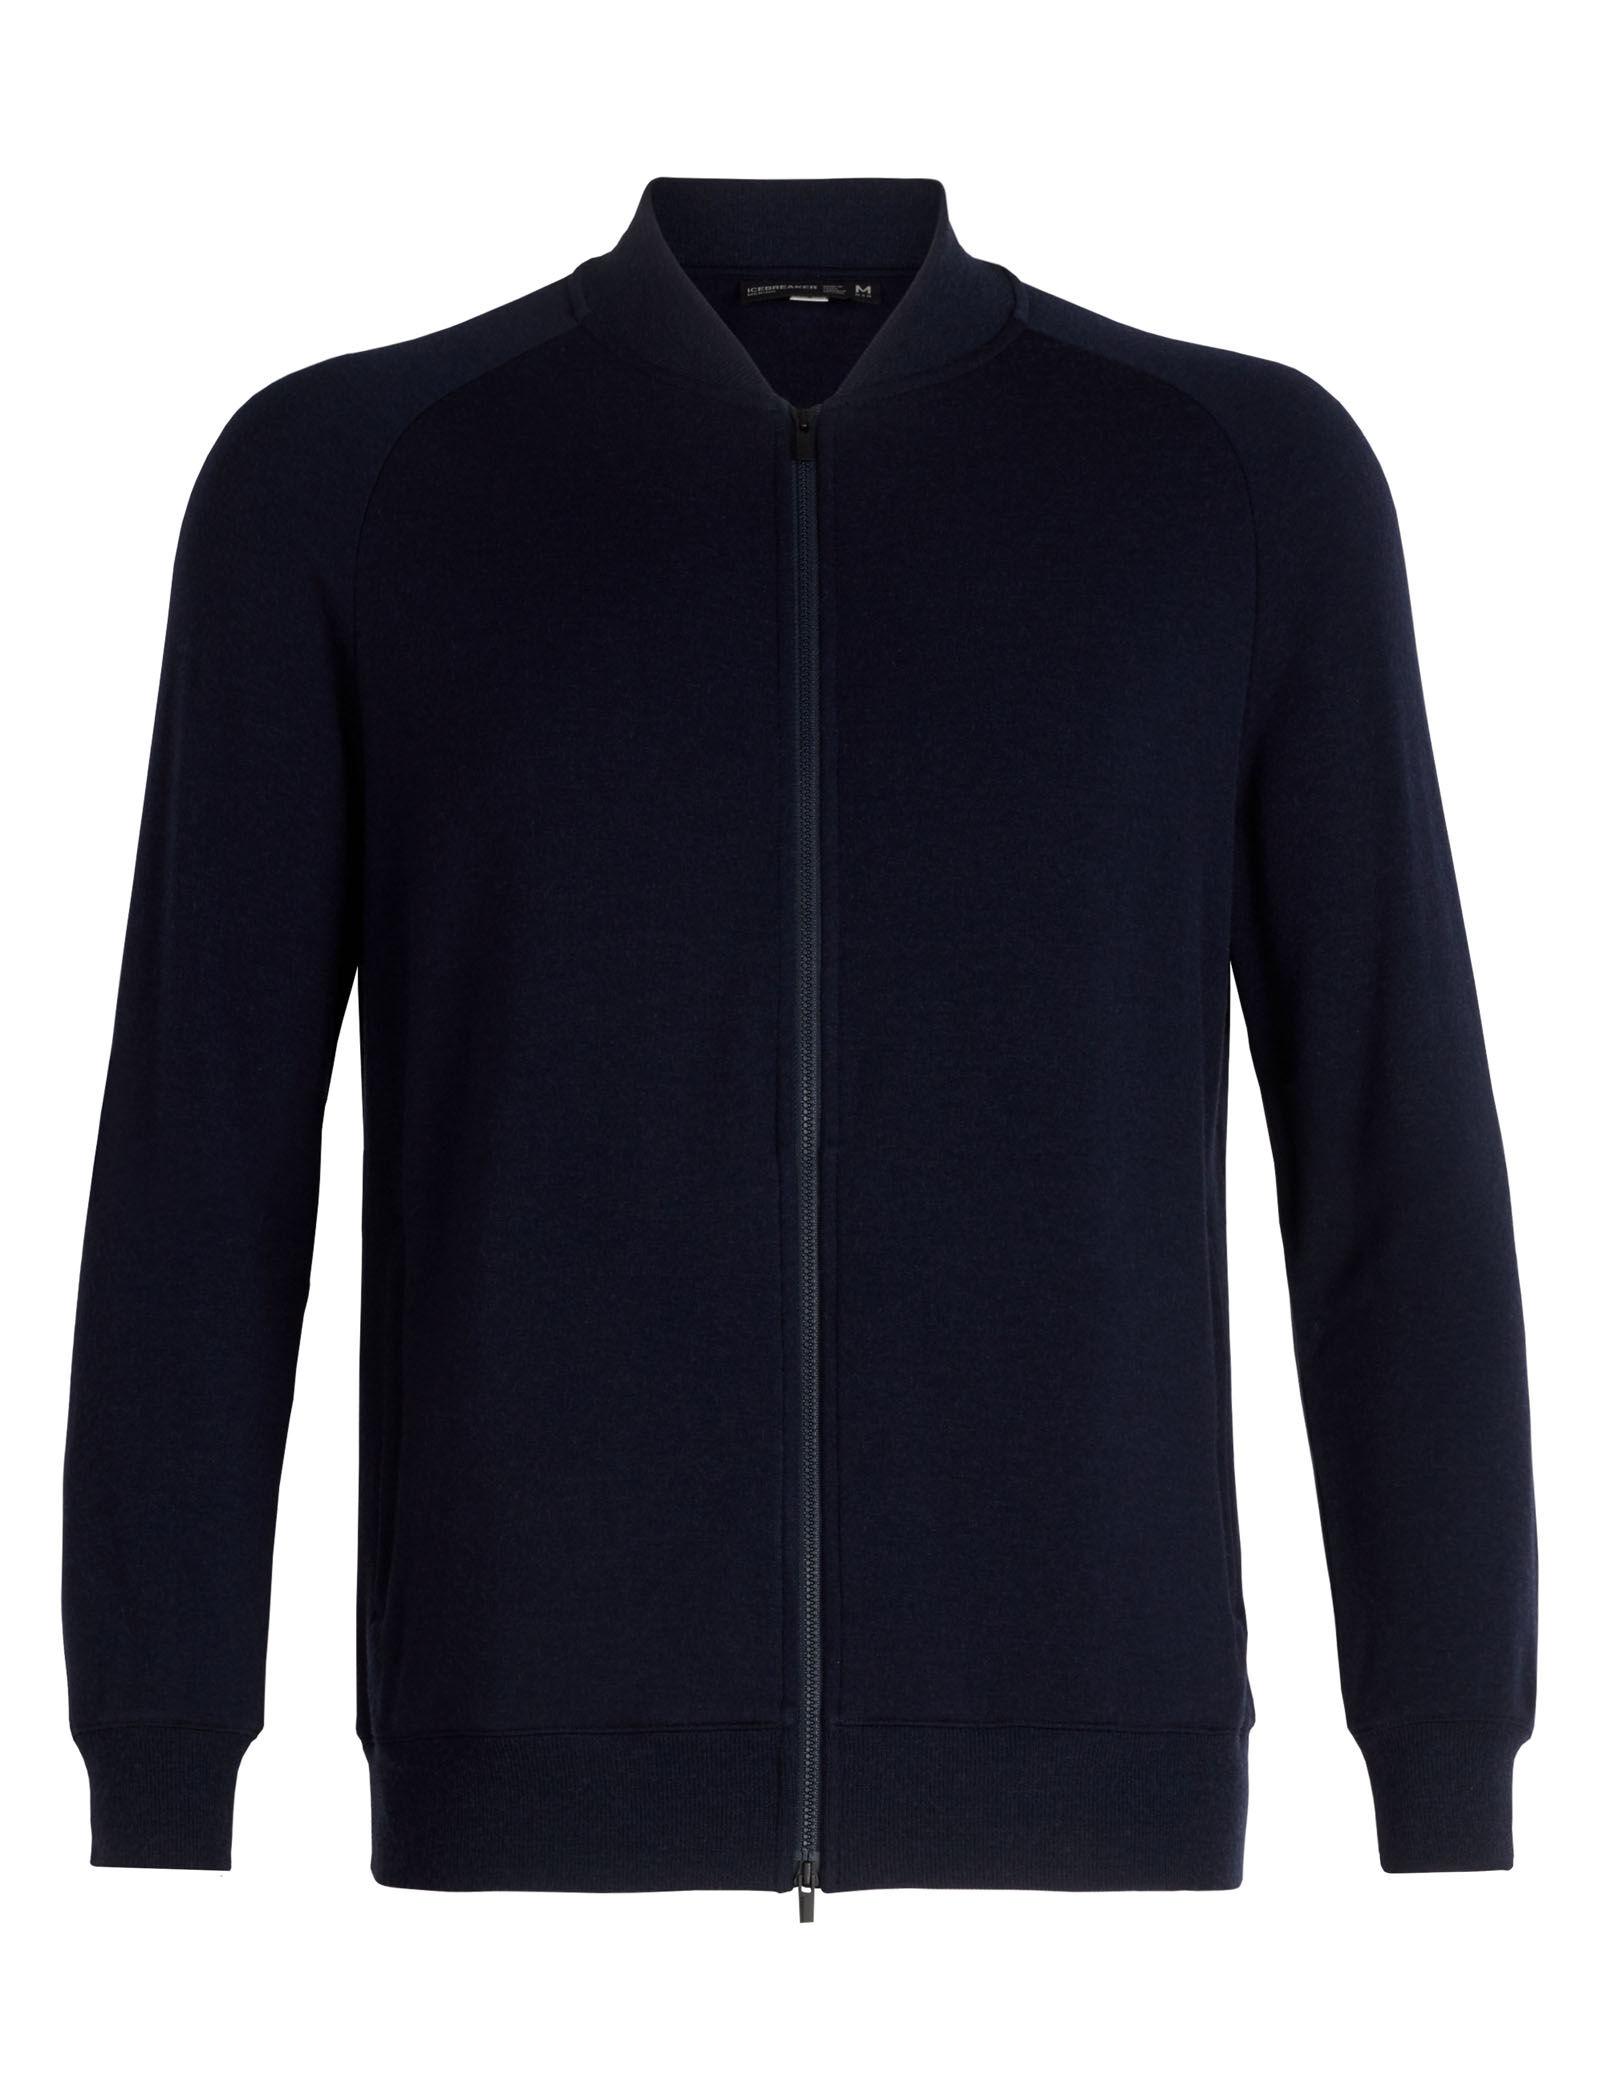 unisex 旅 tabi realfleece® bomber jacket  grund jacken c 8_27 #7